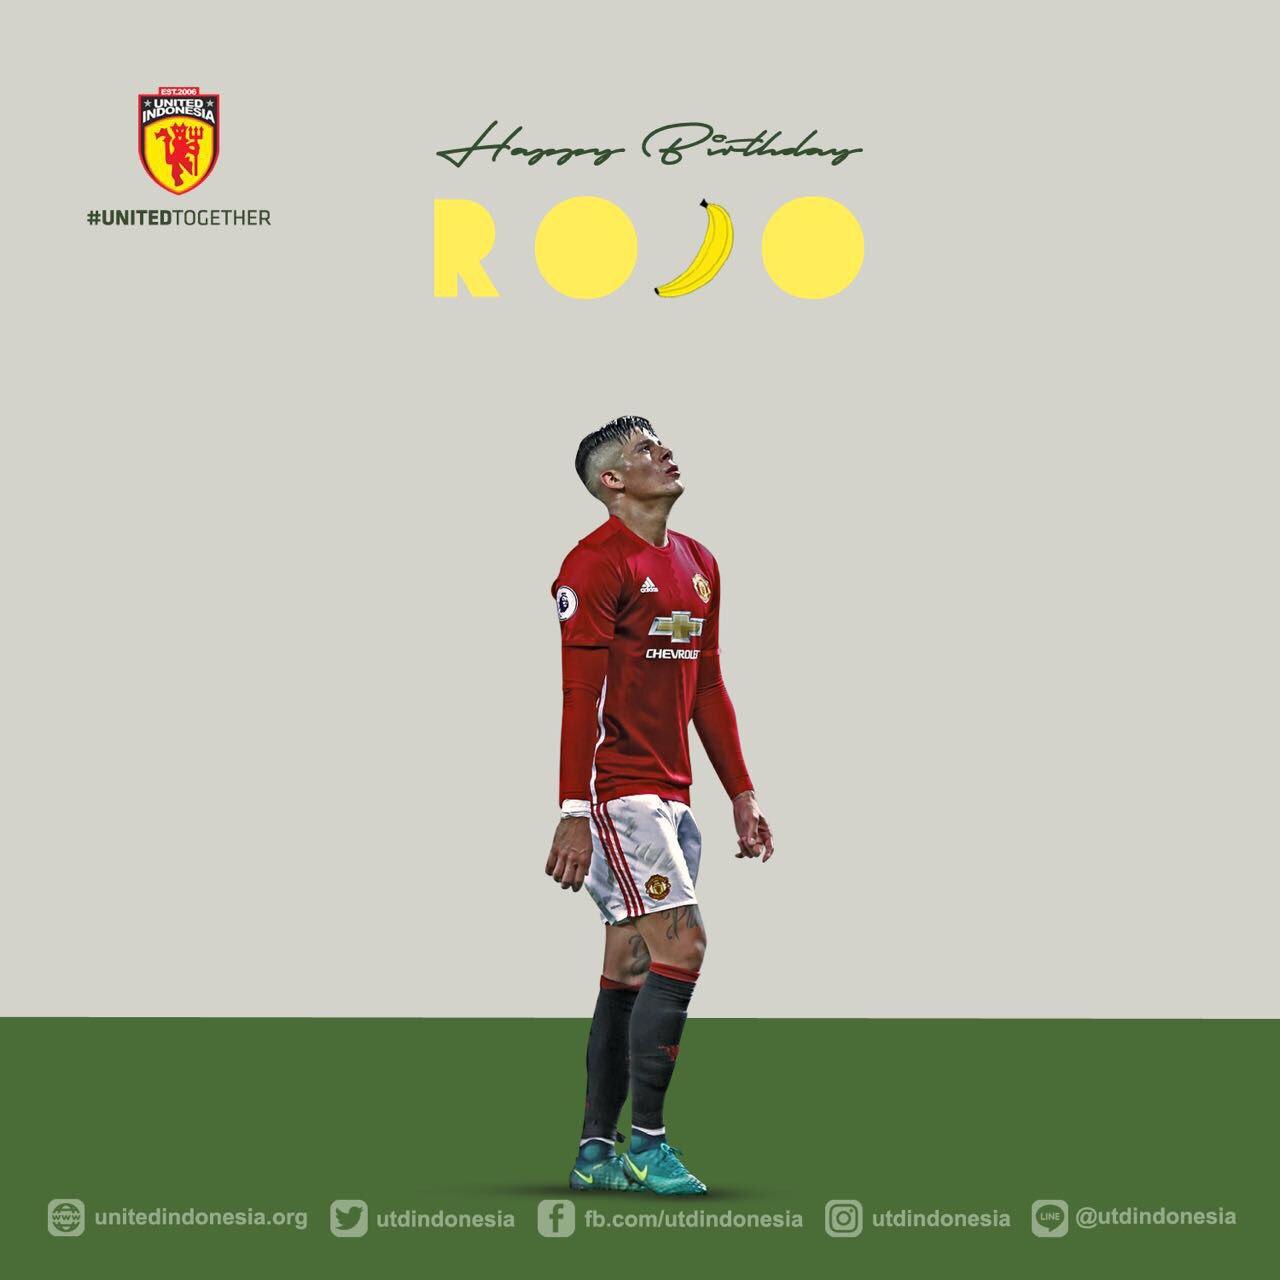 Happy birthday to you bro Marcos Rojo